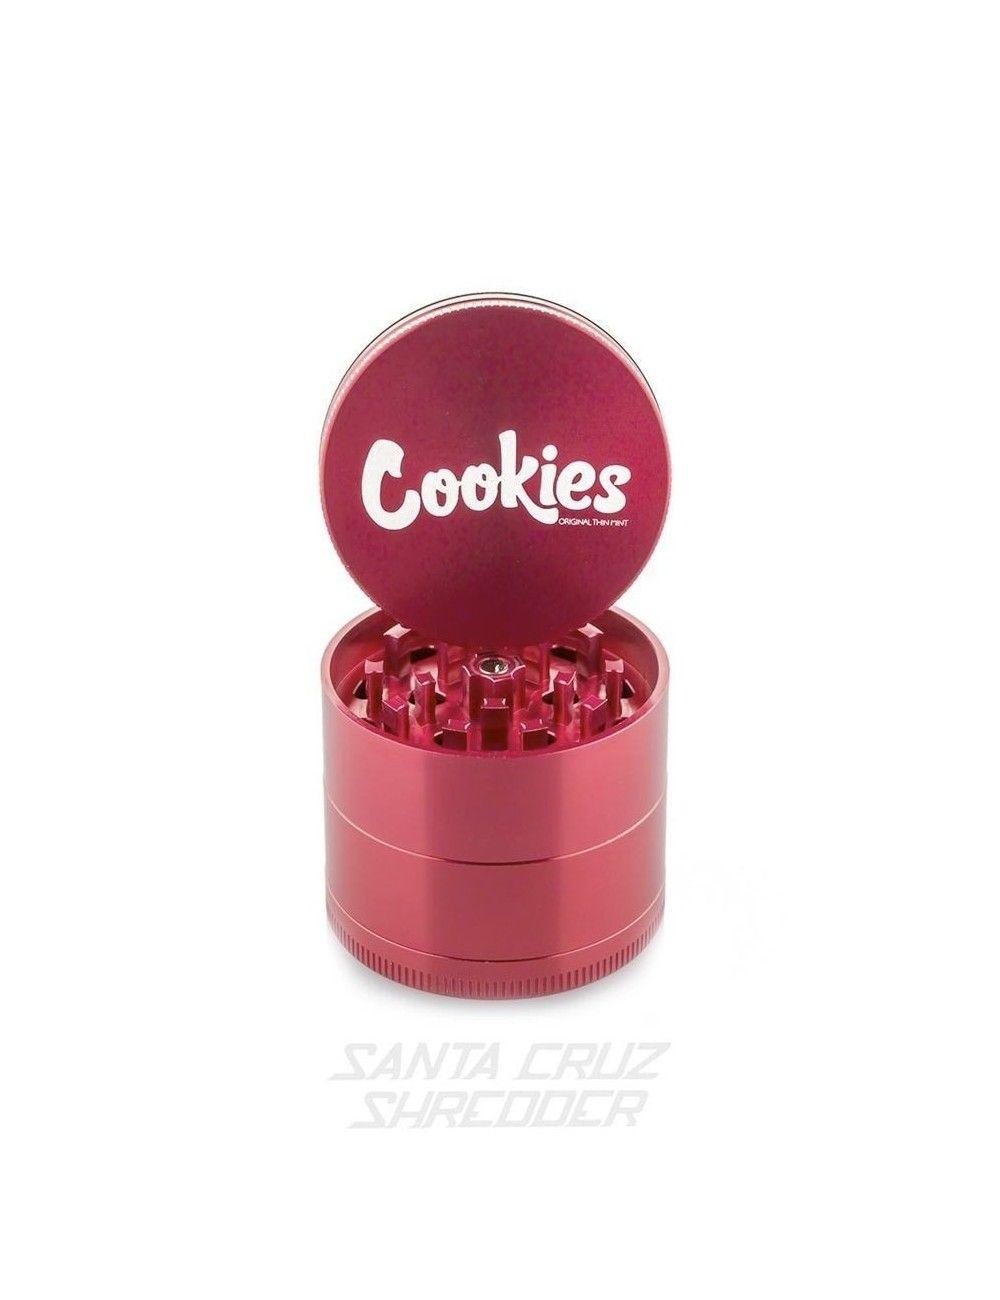 Santa Cruz Shredder 4-piece Medium - Cookies Red